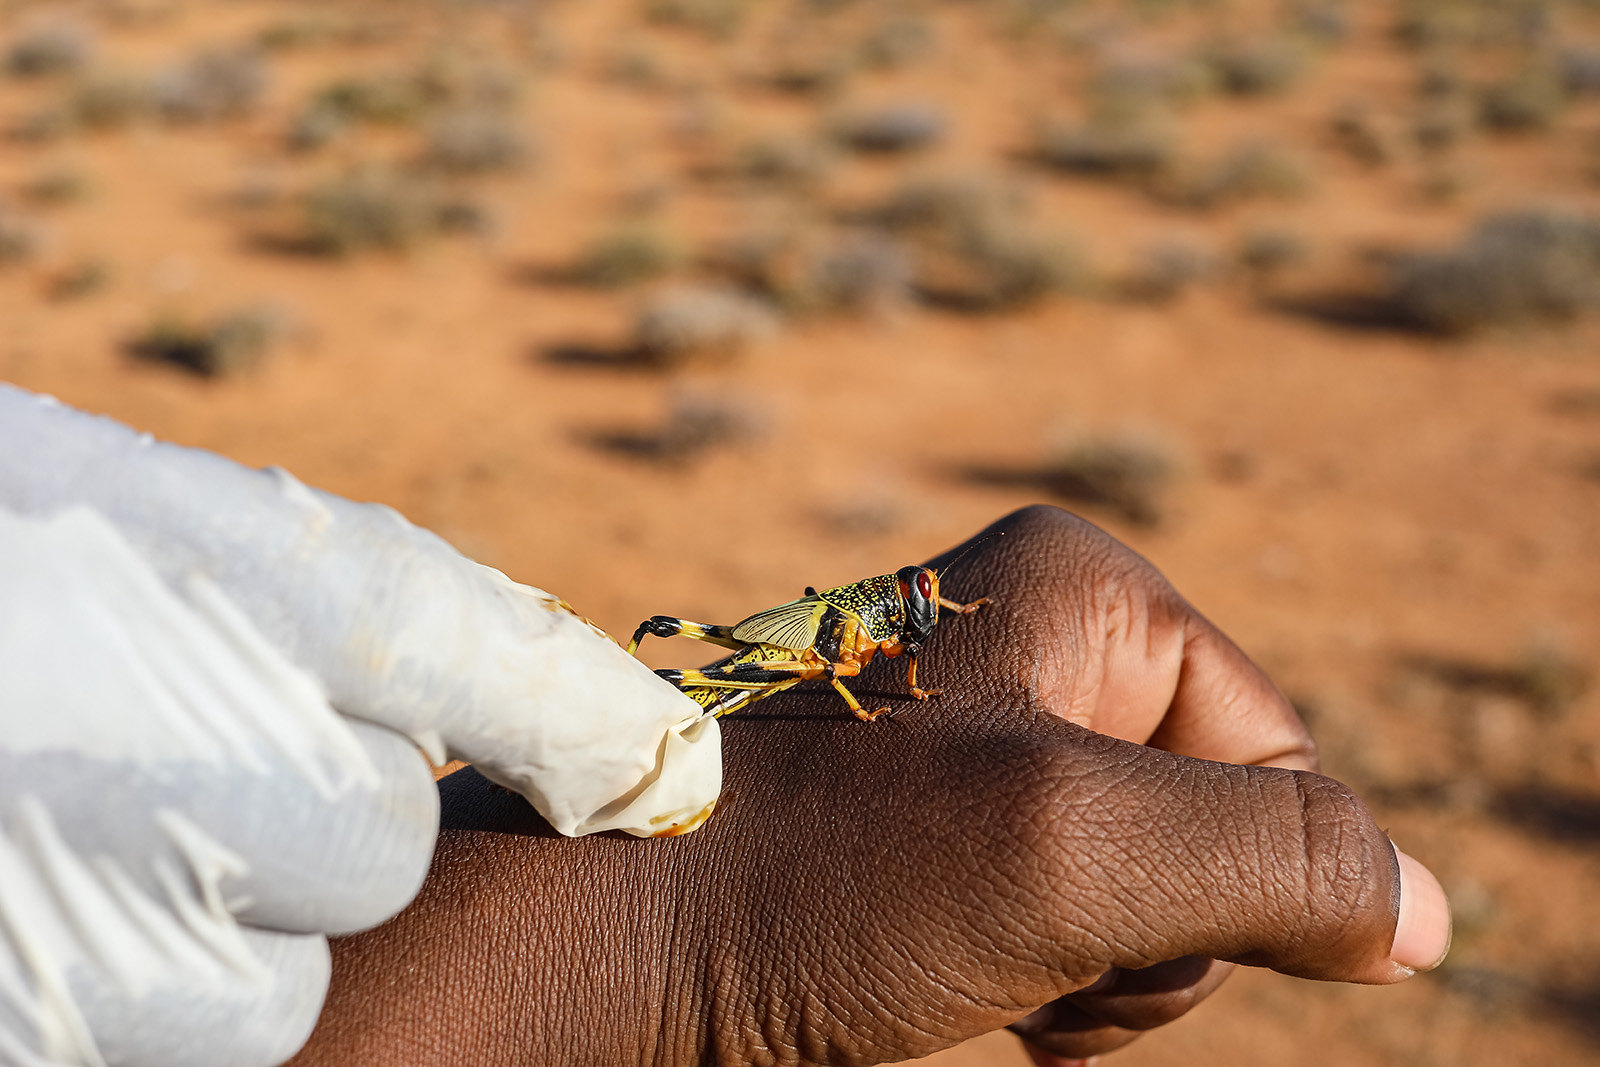 Desert locust response in Somalia